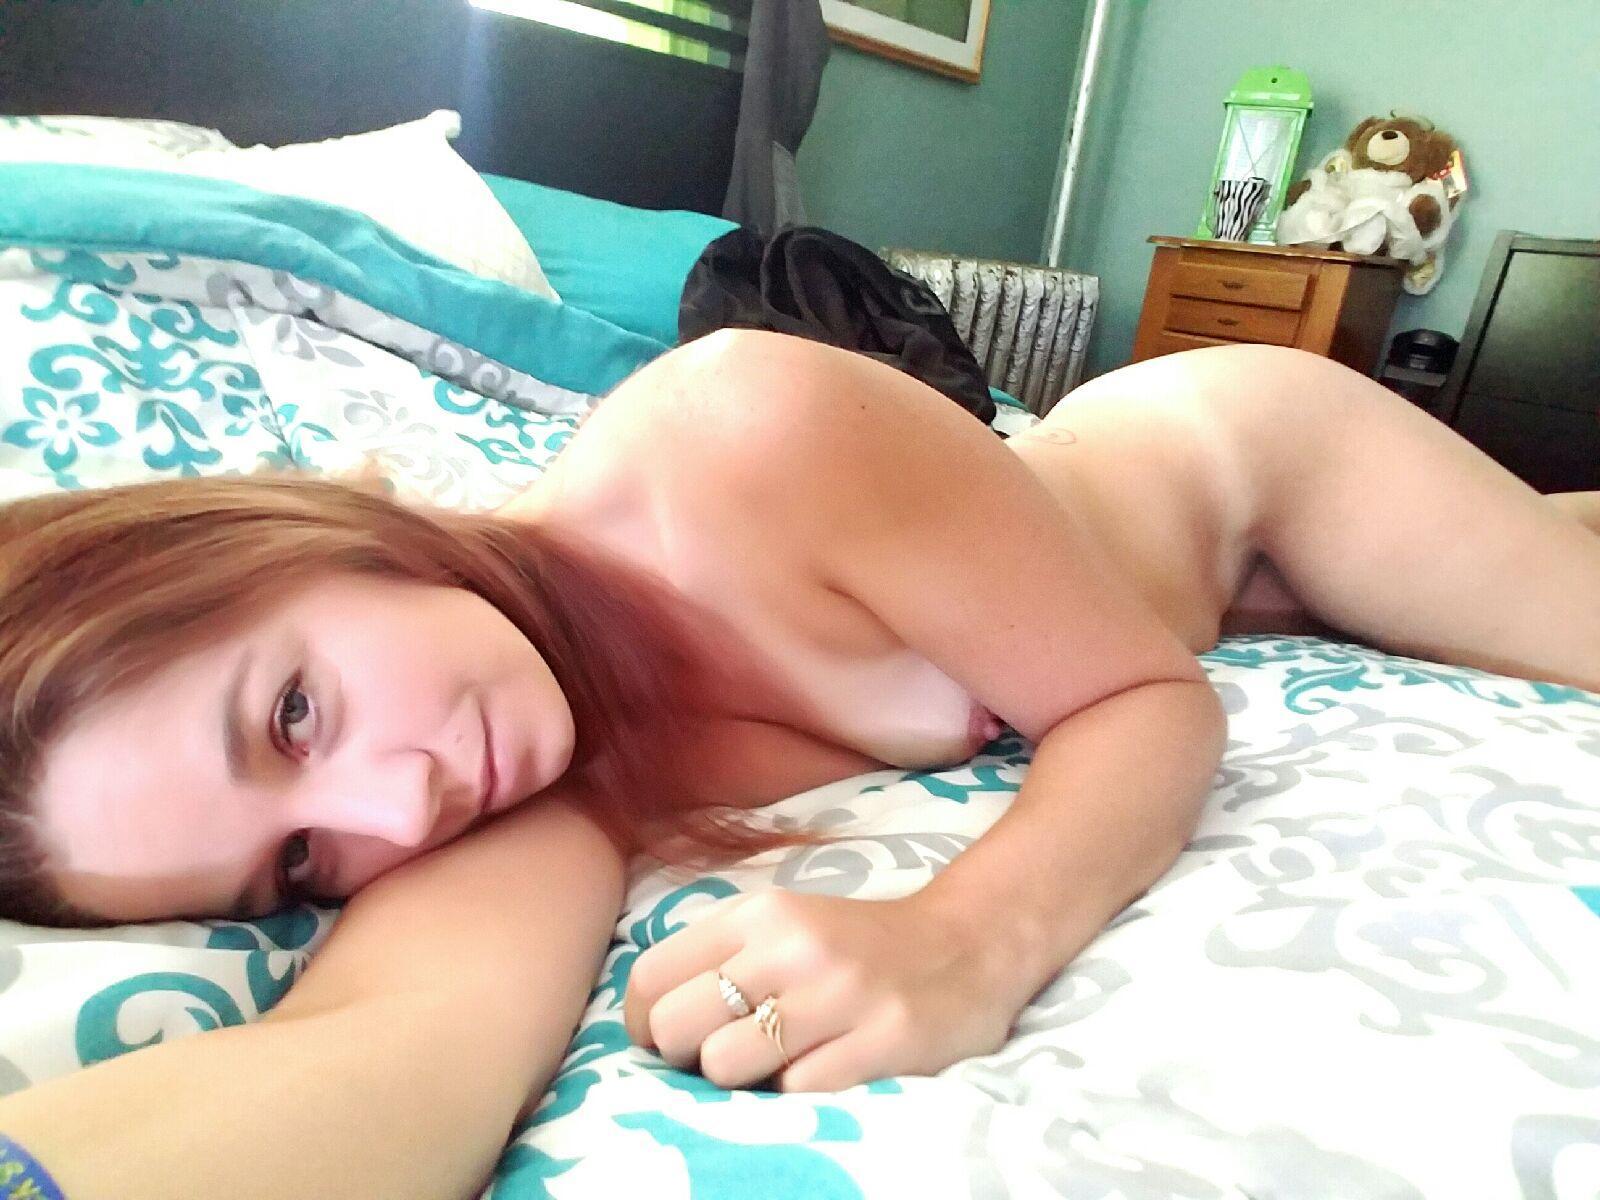 http://www.sextingpics.com/wp-content/uploads/2019/01/img_9016.jpg